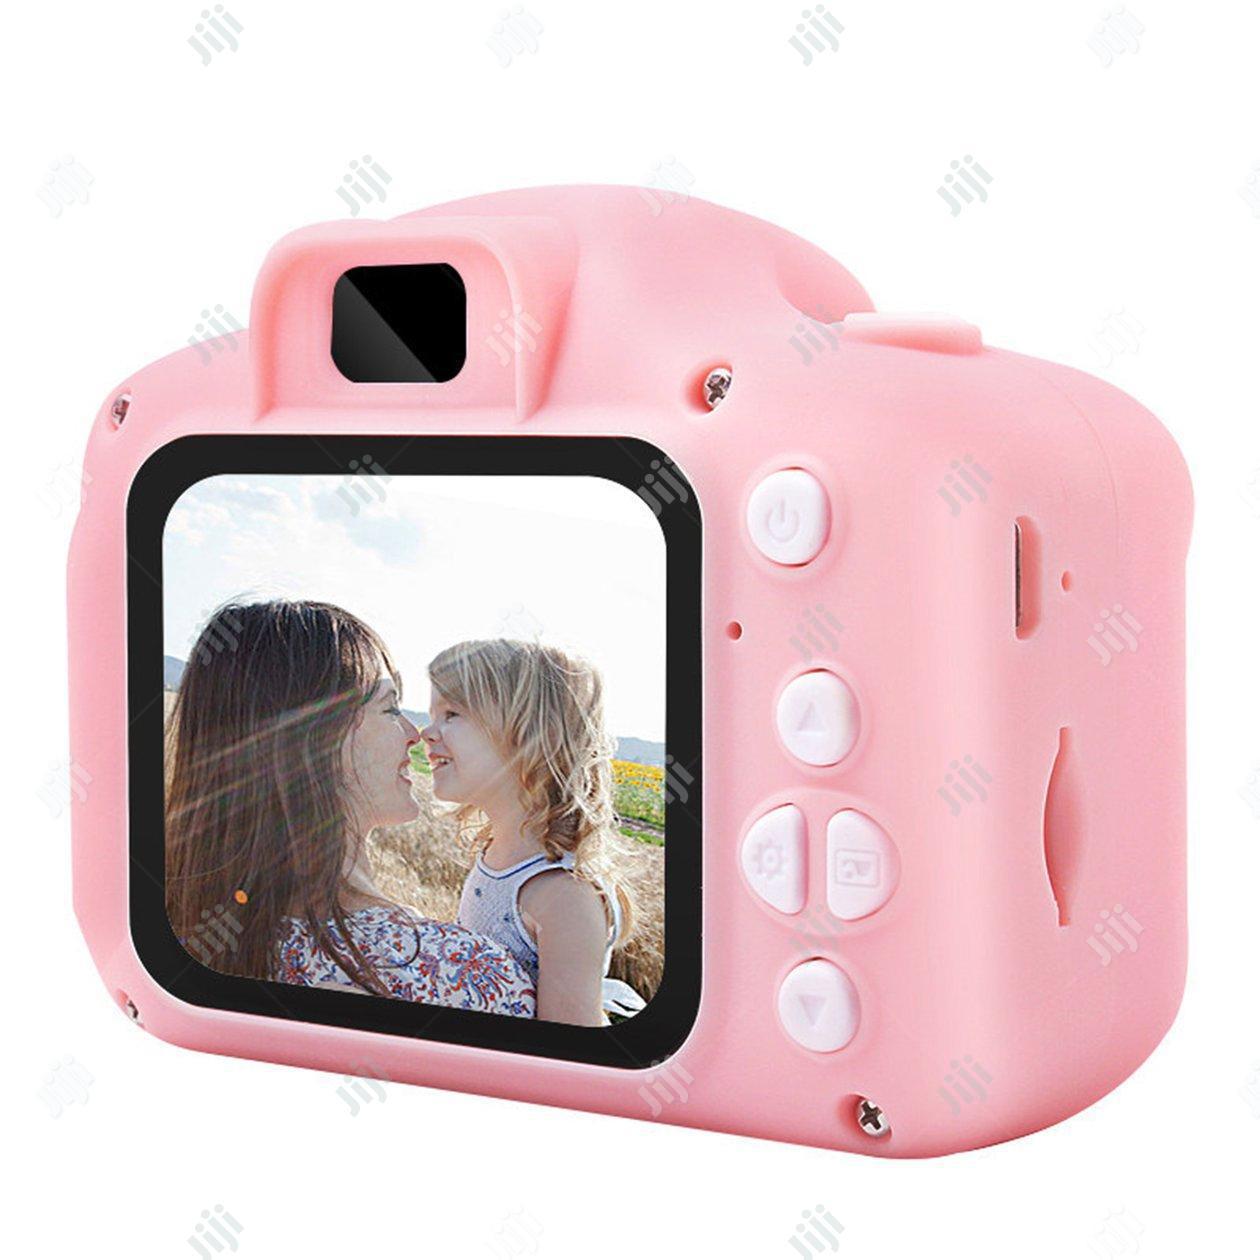 Multipurpose Cartoon Digital Camera For Kids - Pink   Toys for sale in Ikeja, Lagos State, Nigeria